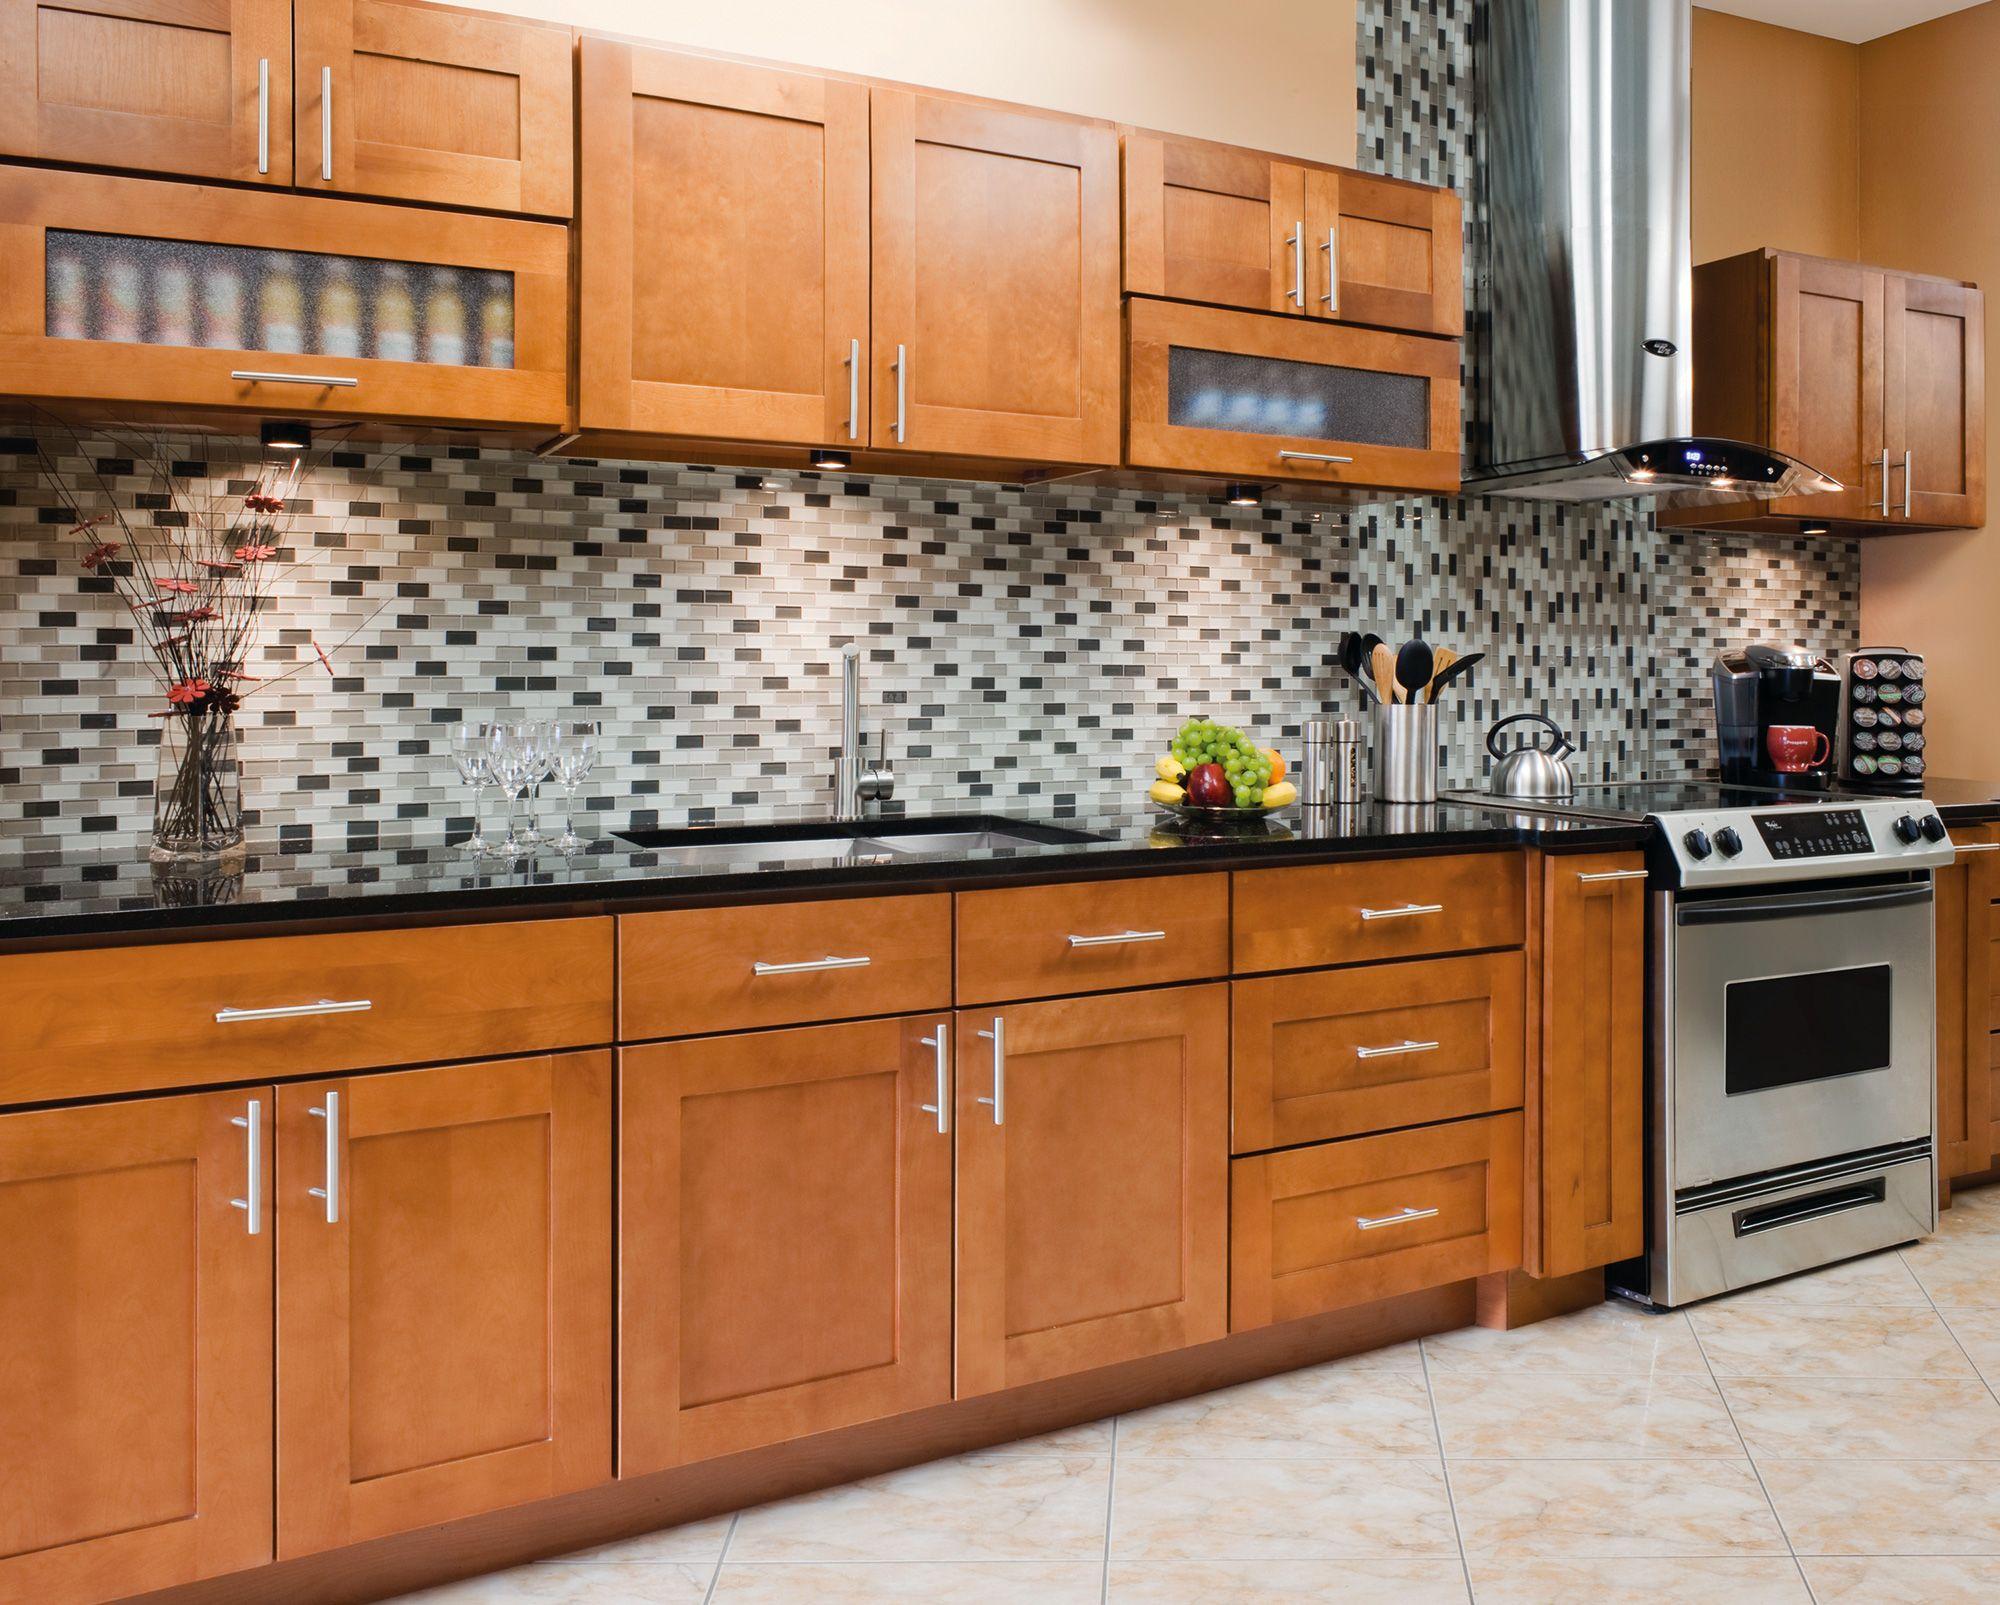 12 X 10 Kitchen Layouts Wood Construction Newport Style Kitchen Cabinets 12 X 1 Kitchen Cabinet Styles Used Kitchen Cabinets Solid Wood Kitchen Cabinets